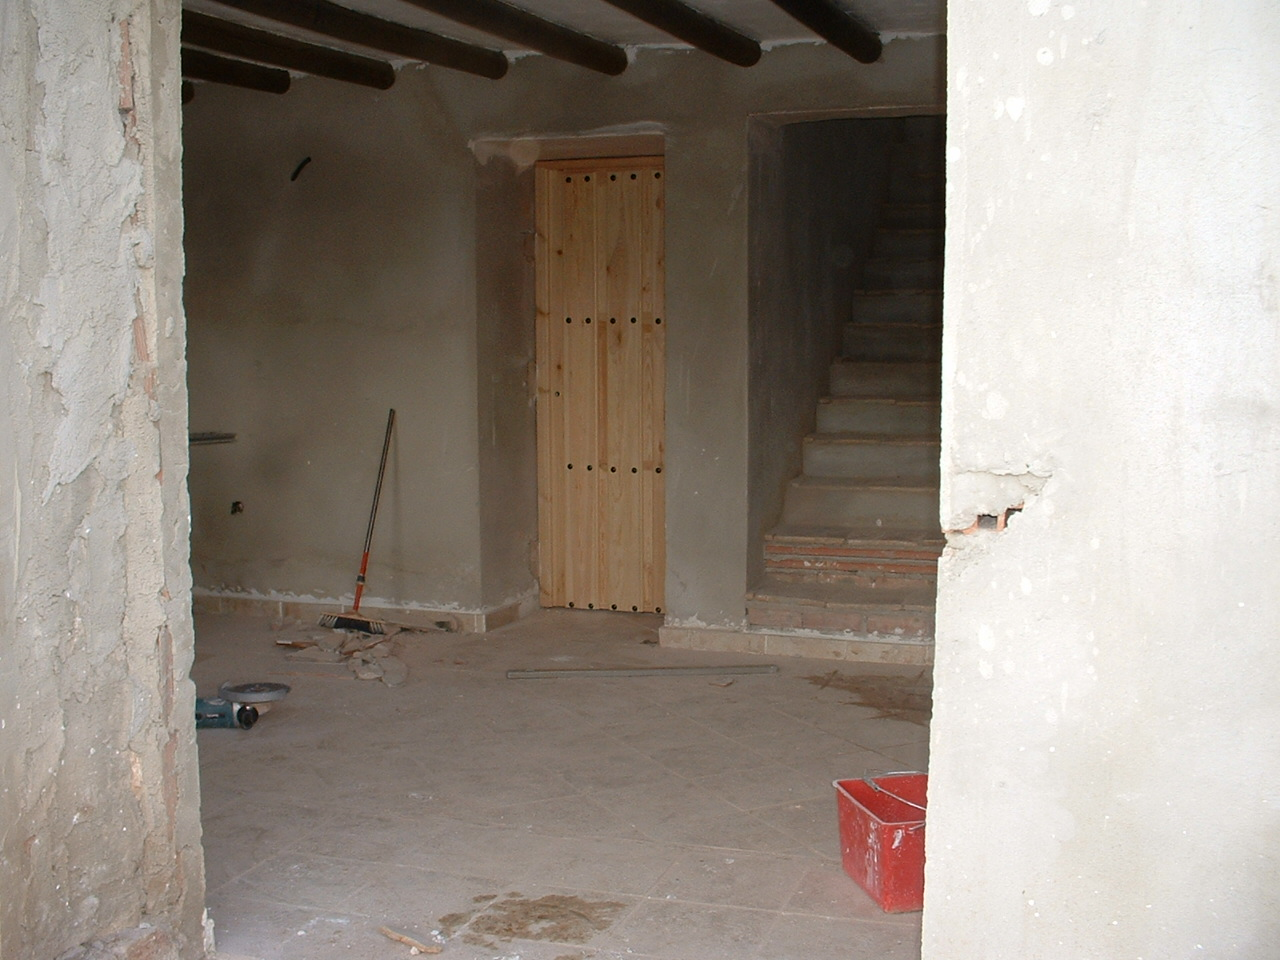 Doors and Windows added